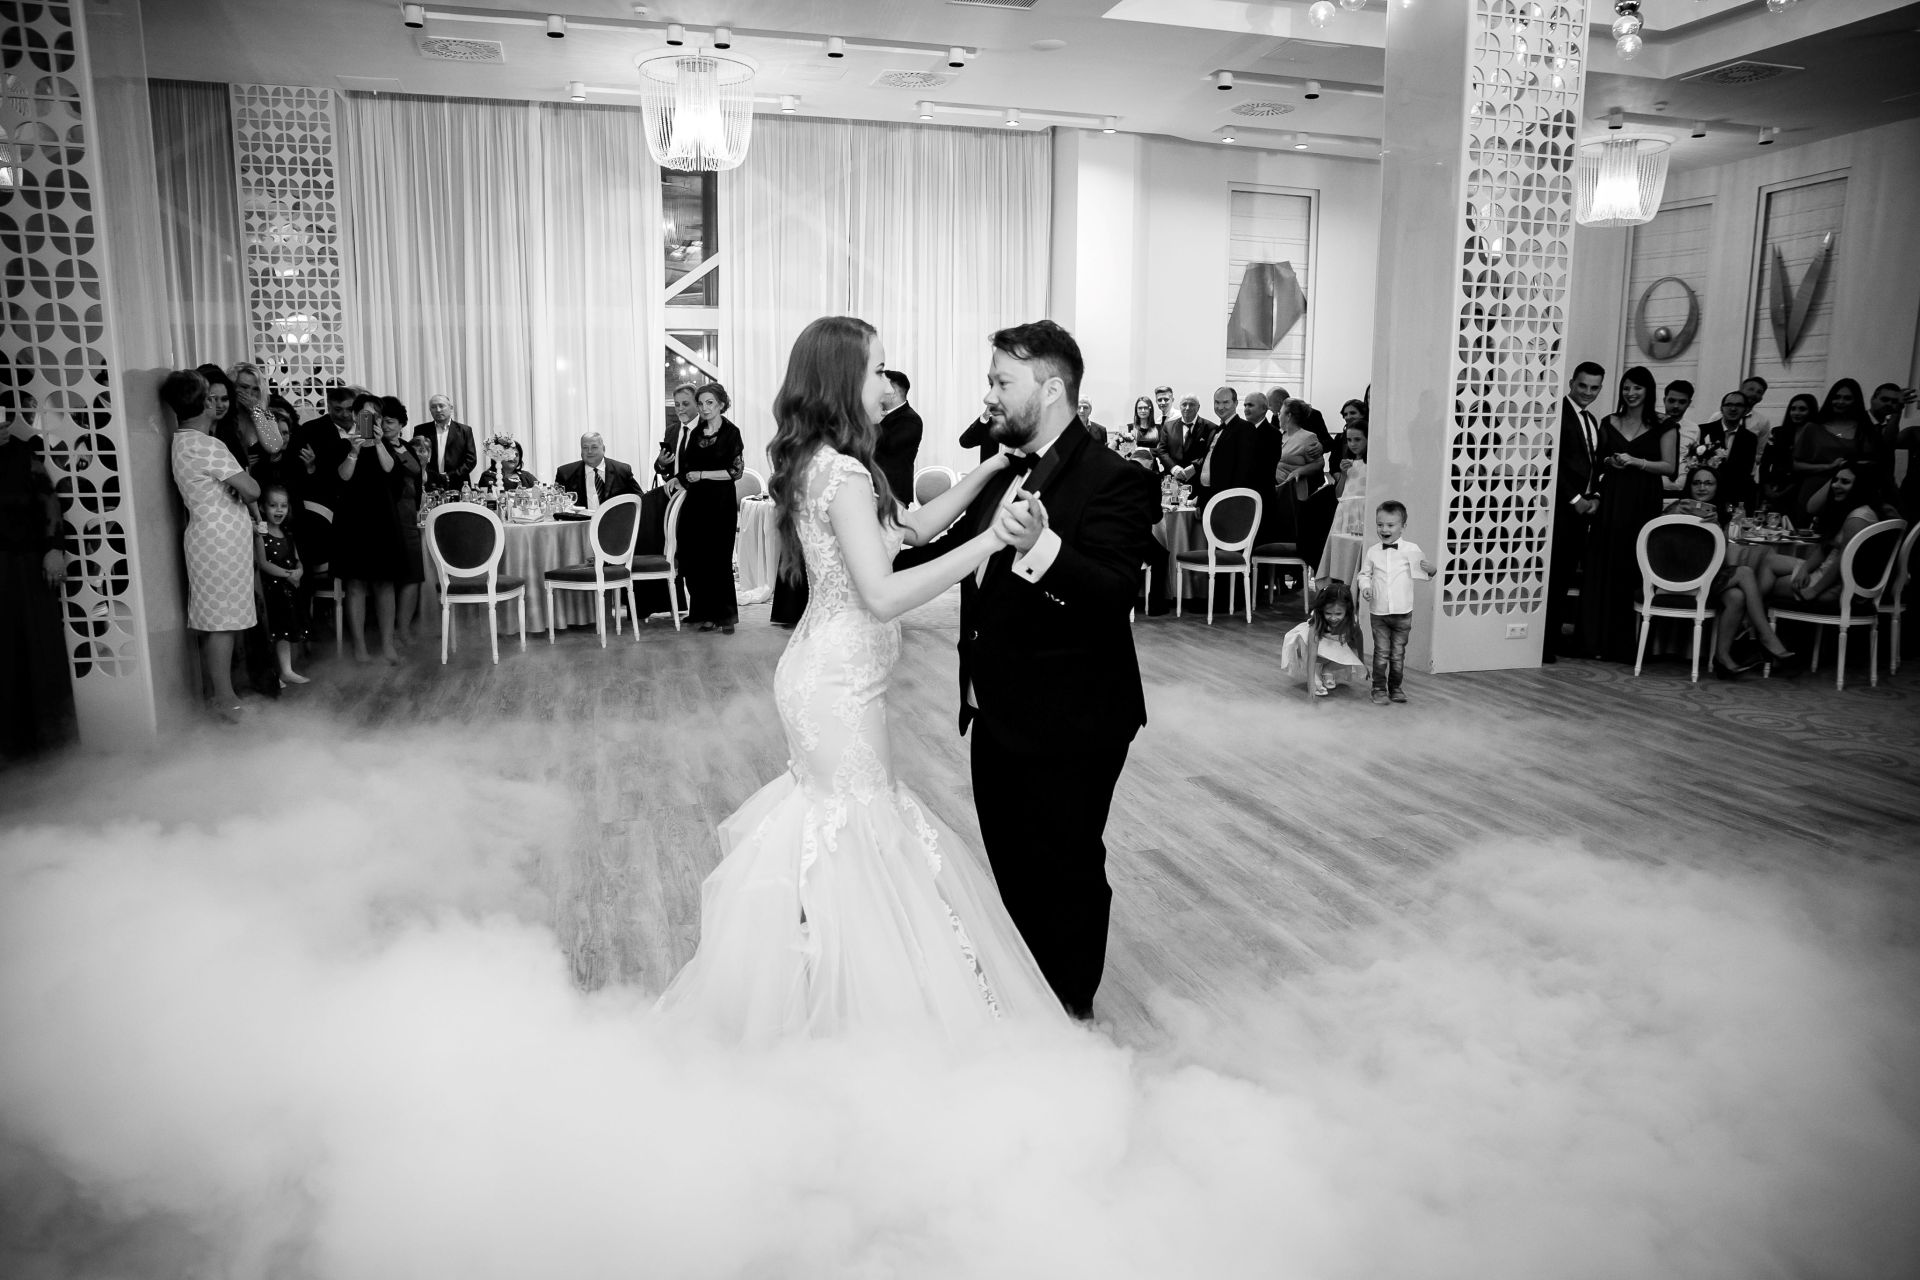 Larisa si Vlad - Nunta la Unirea - fotograf nunta iasi   fotograf profesionist Paul Padurariu 25